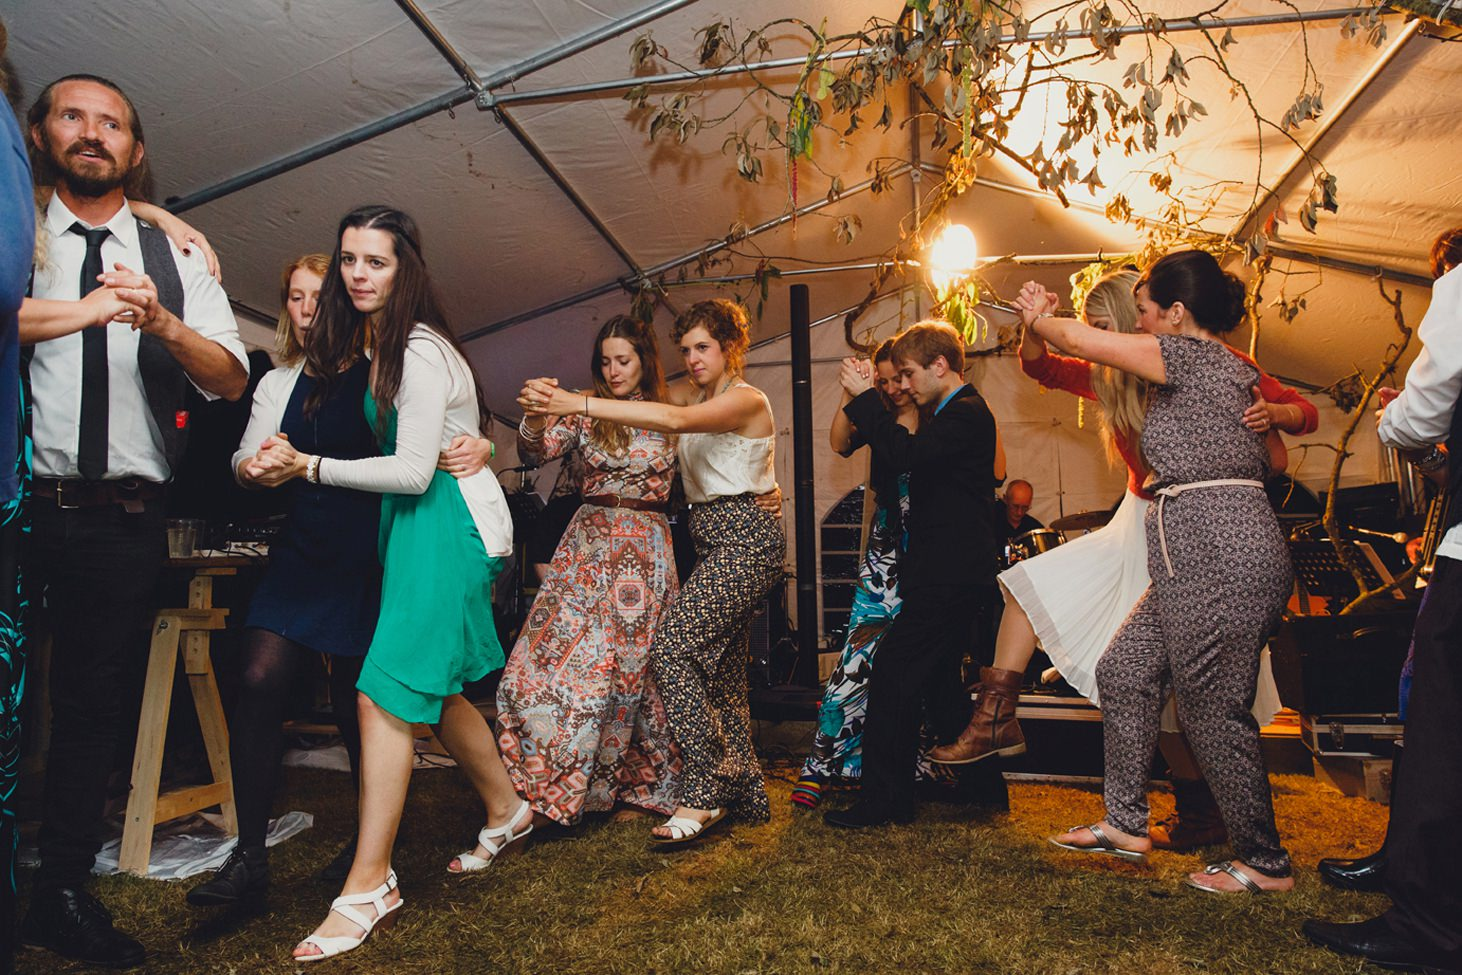 mount stuart wedding photography Ceilidh dancing